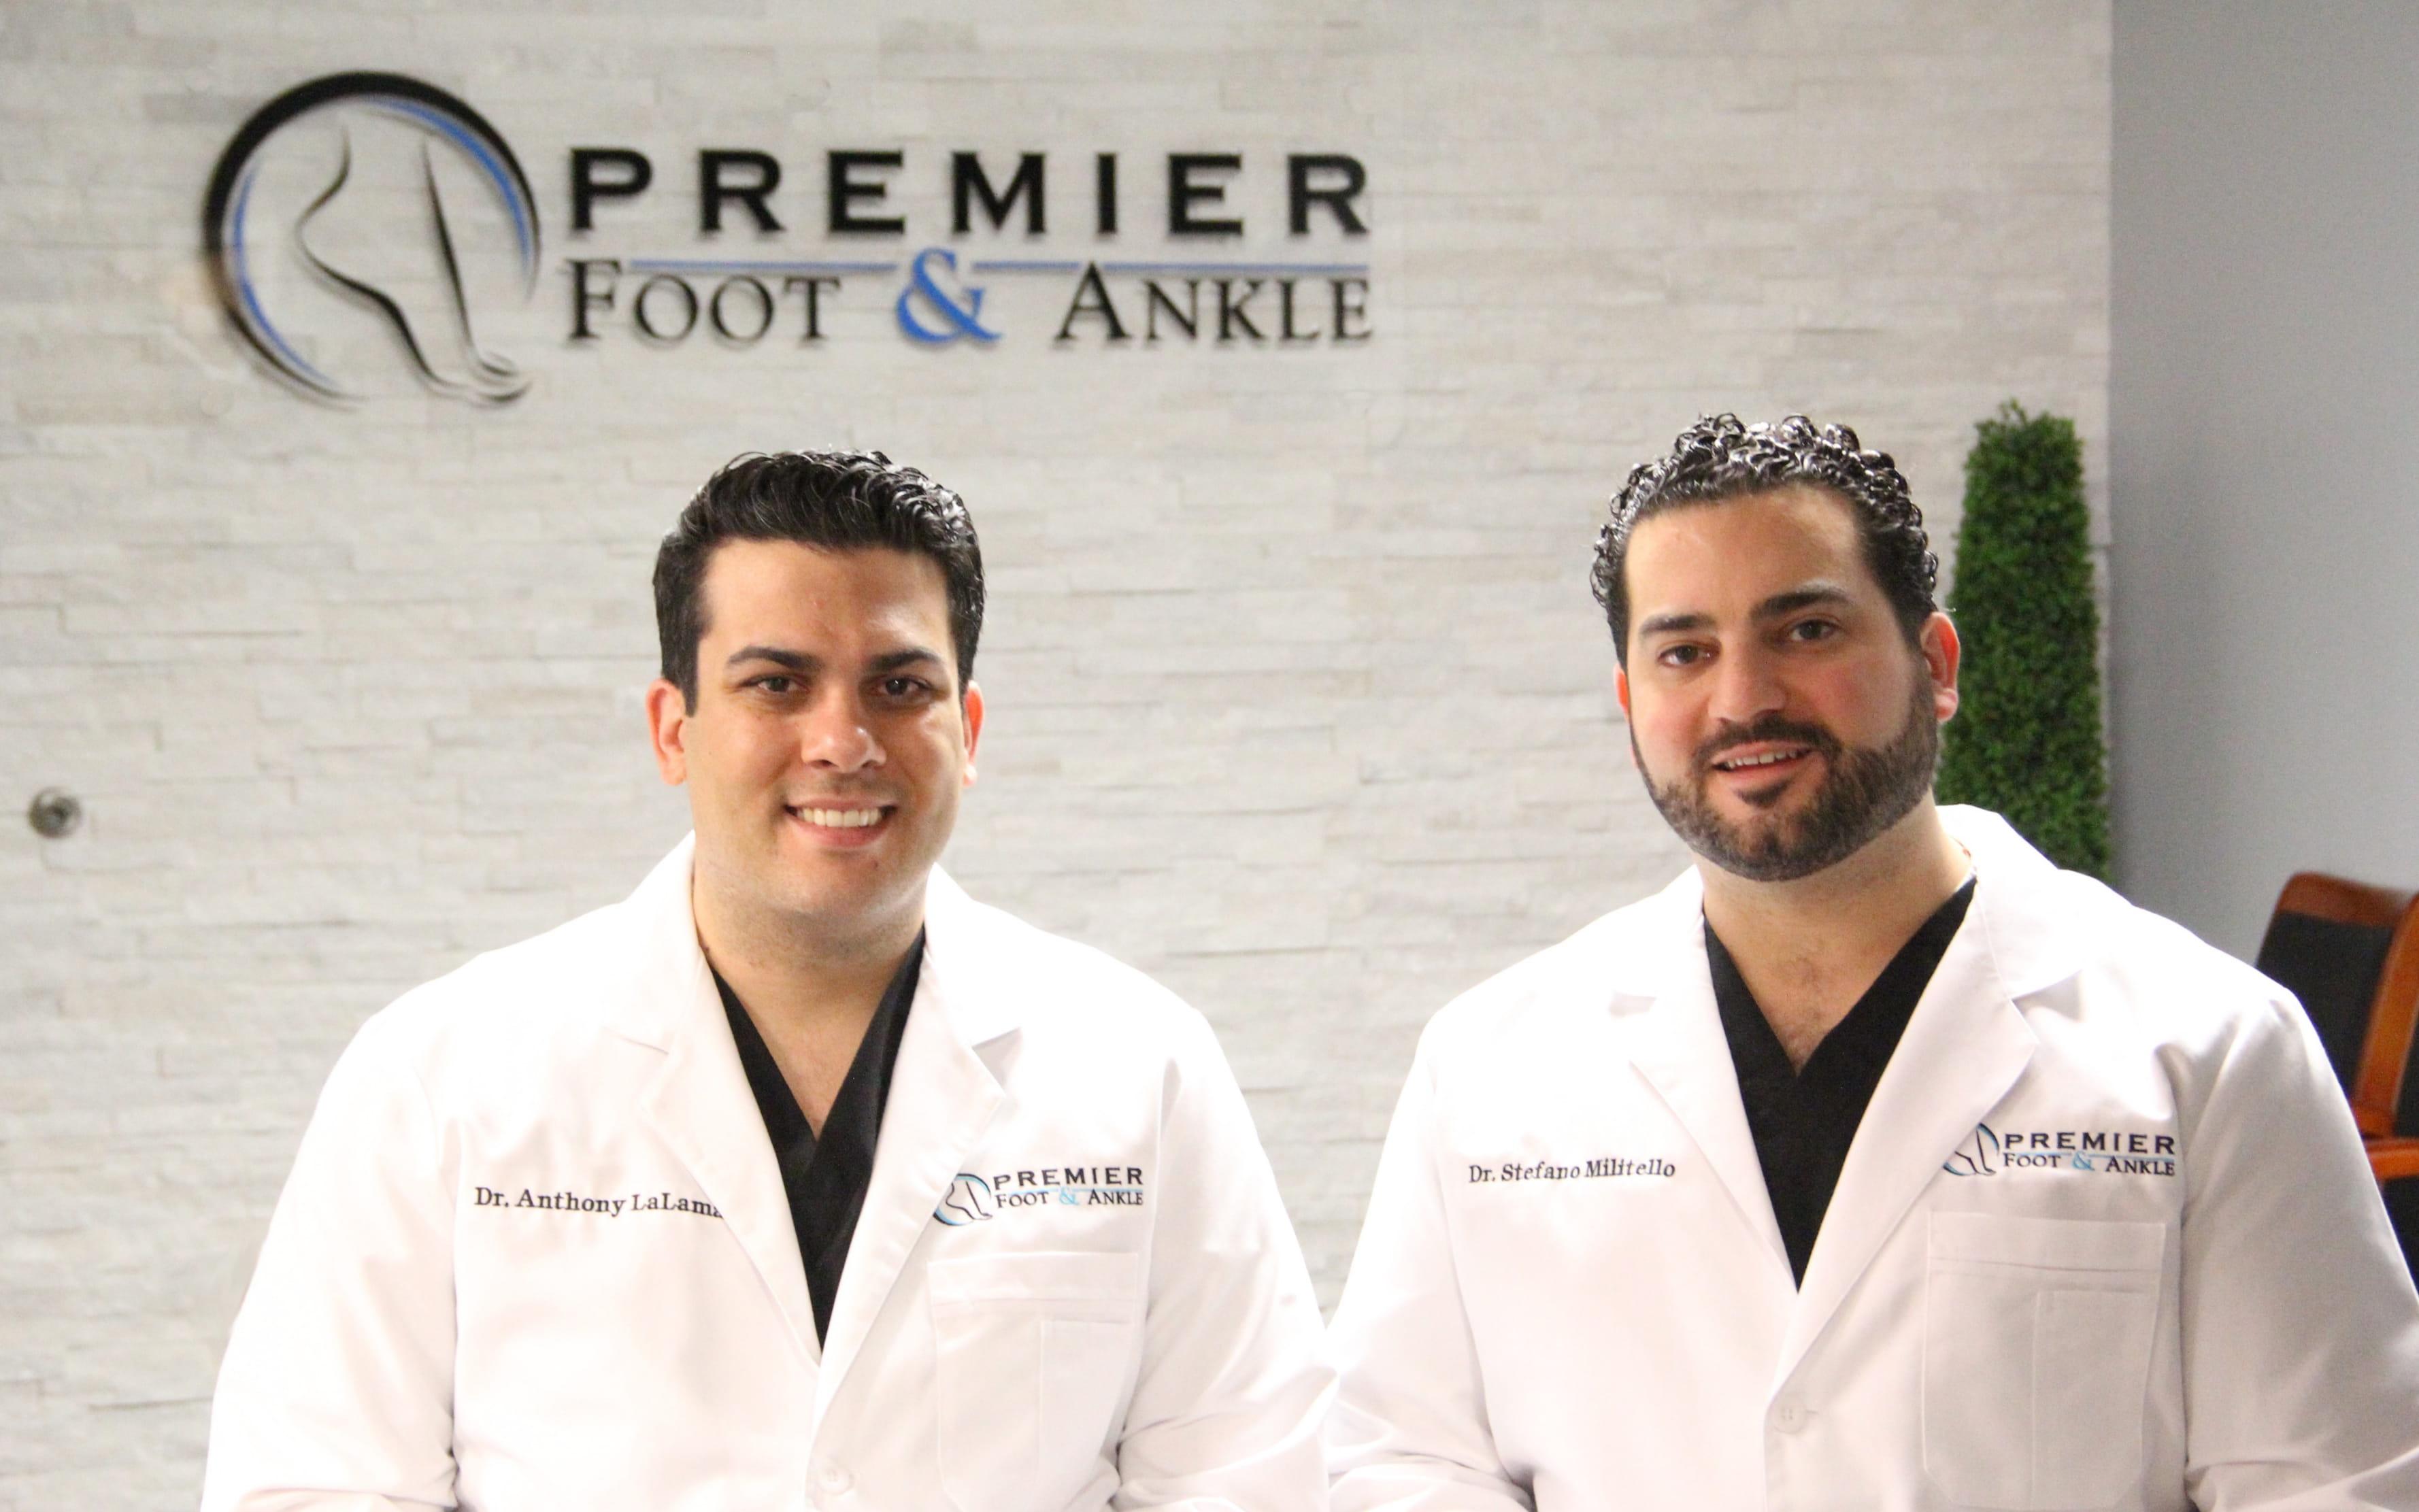 Podiatrist in Macomb, Michigan - Foot Care | Premier Foot